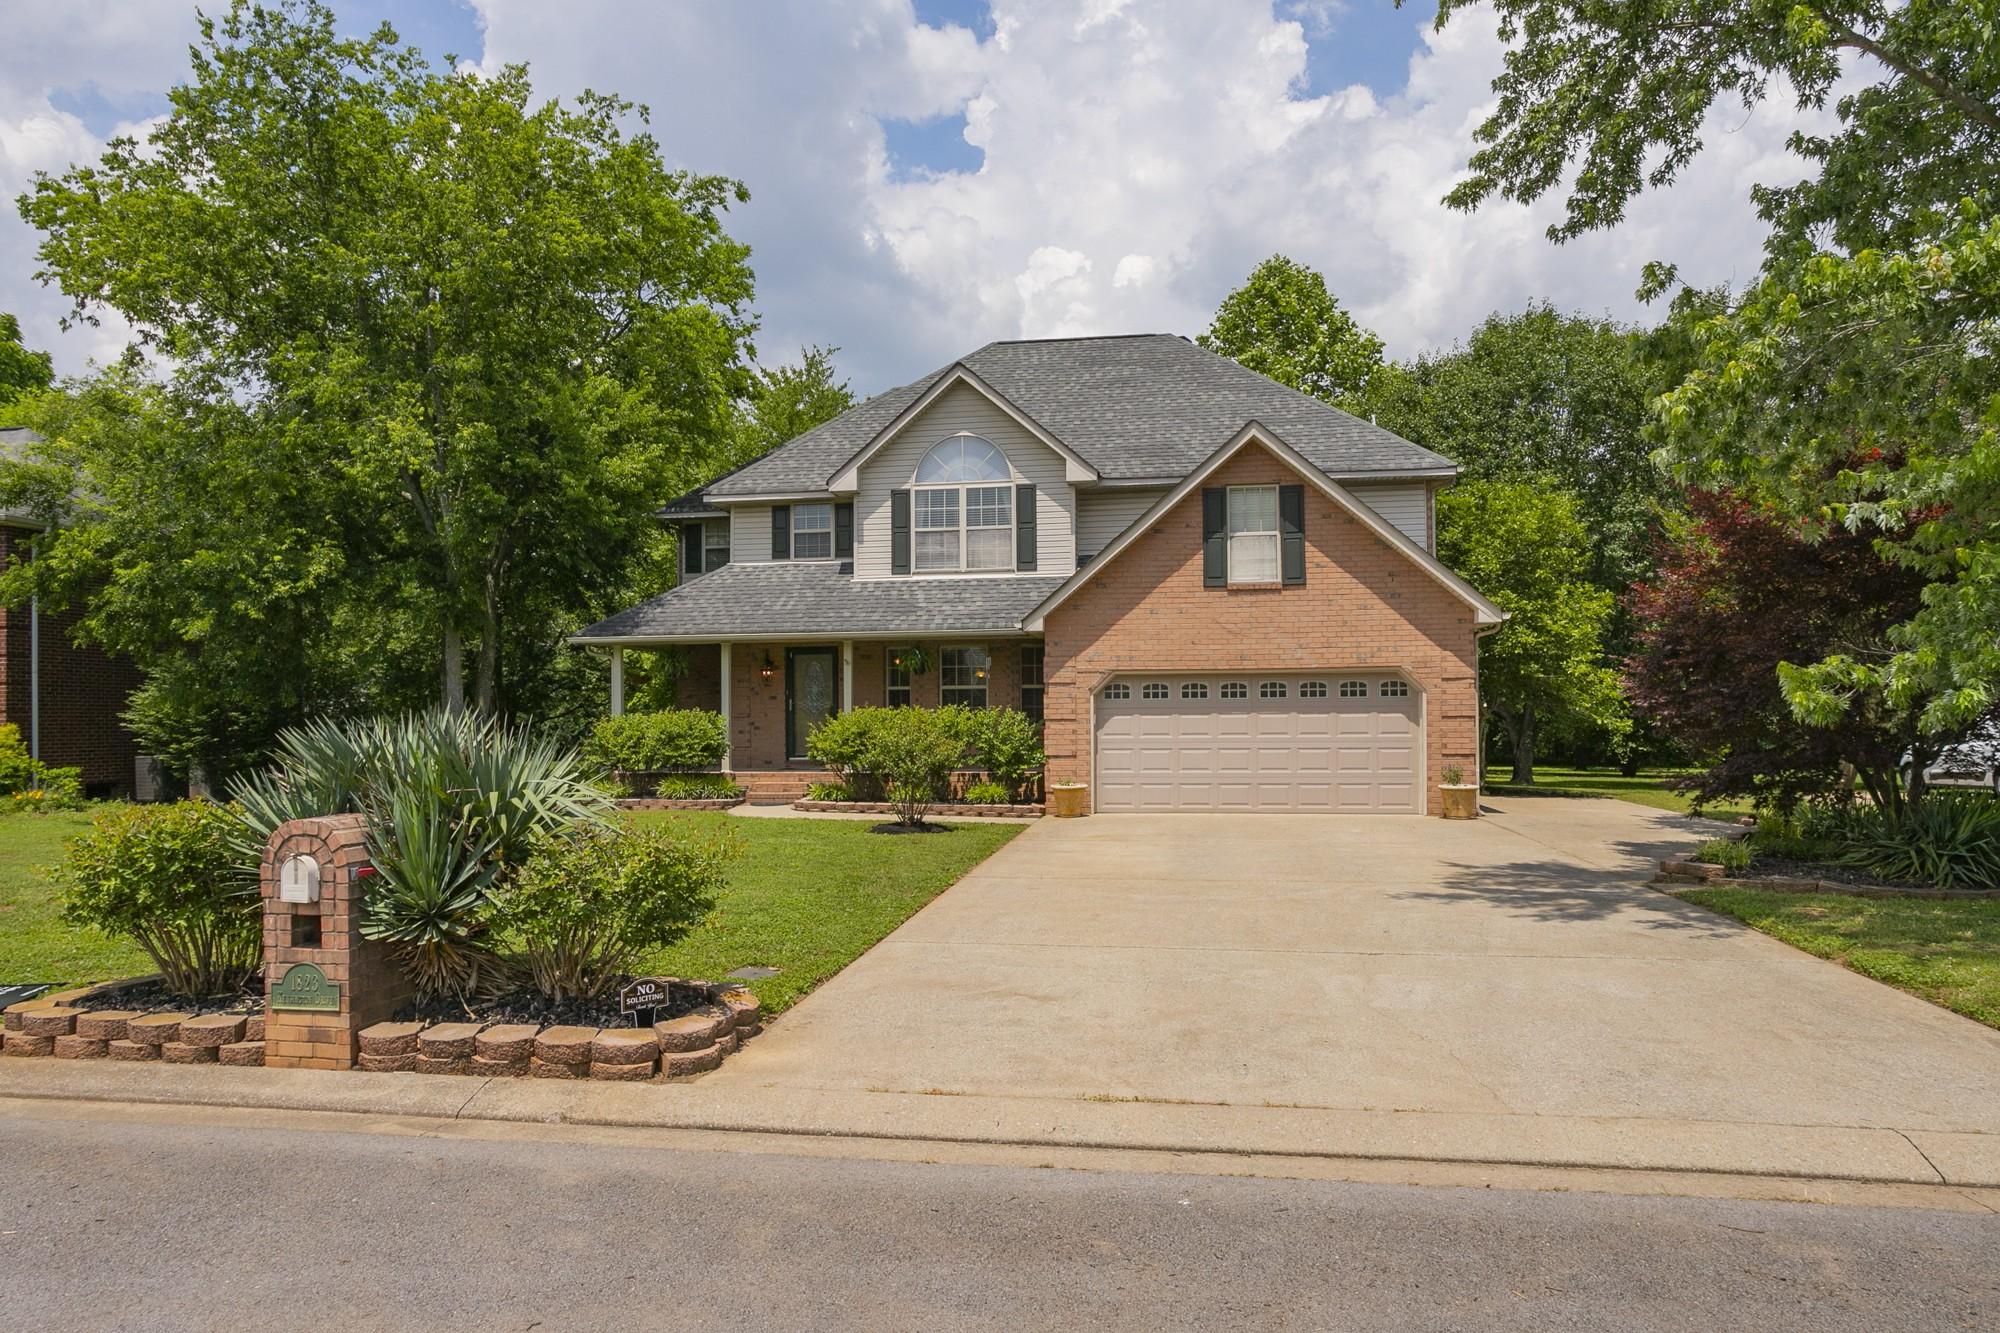 1823 Kensington Dr Property Photo - Murfreesboro, TN real estate listing